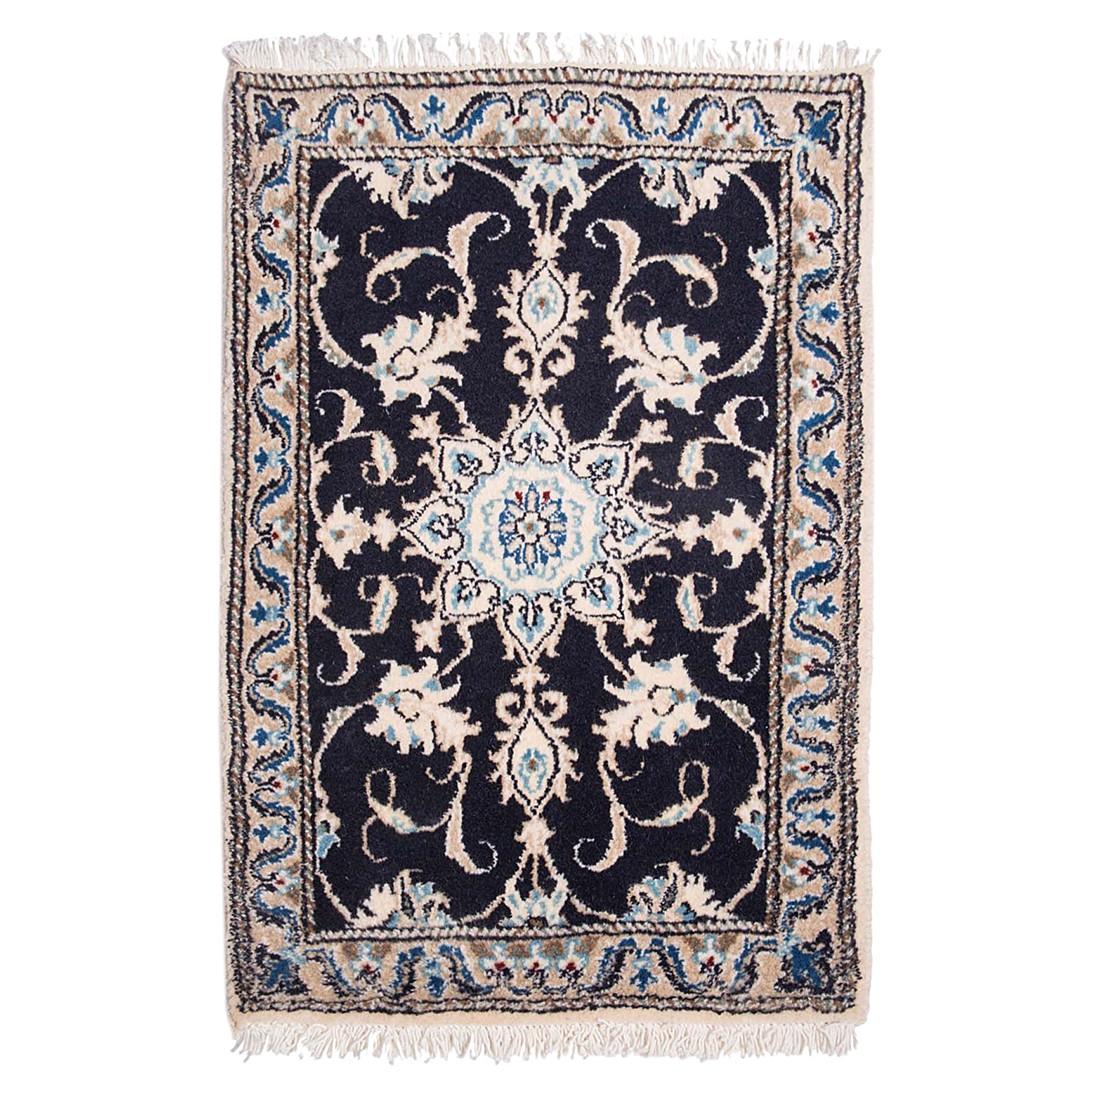 Tapijt Khorasan Nain - Zwart - 40x60cm, Parwis